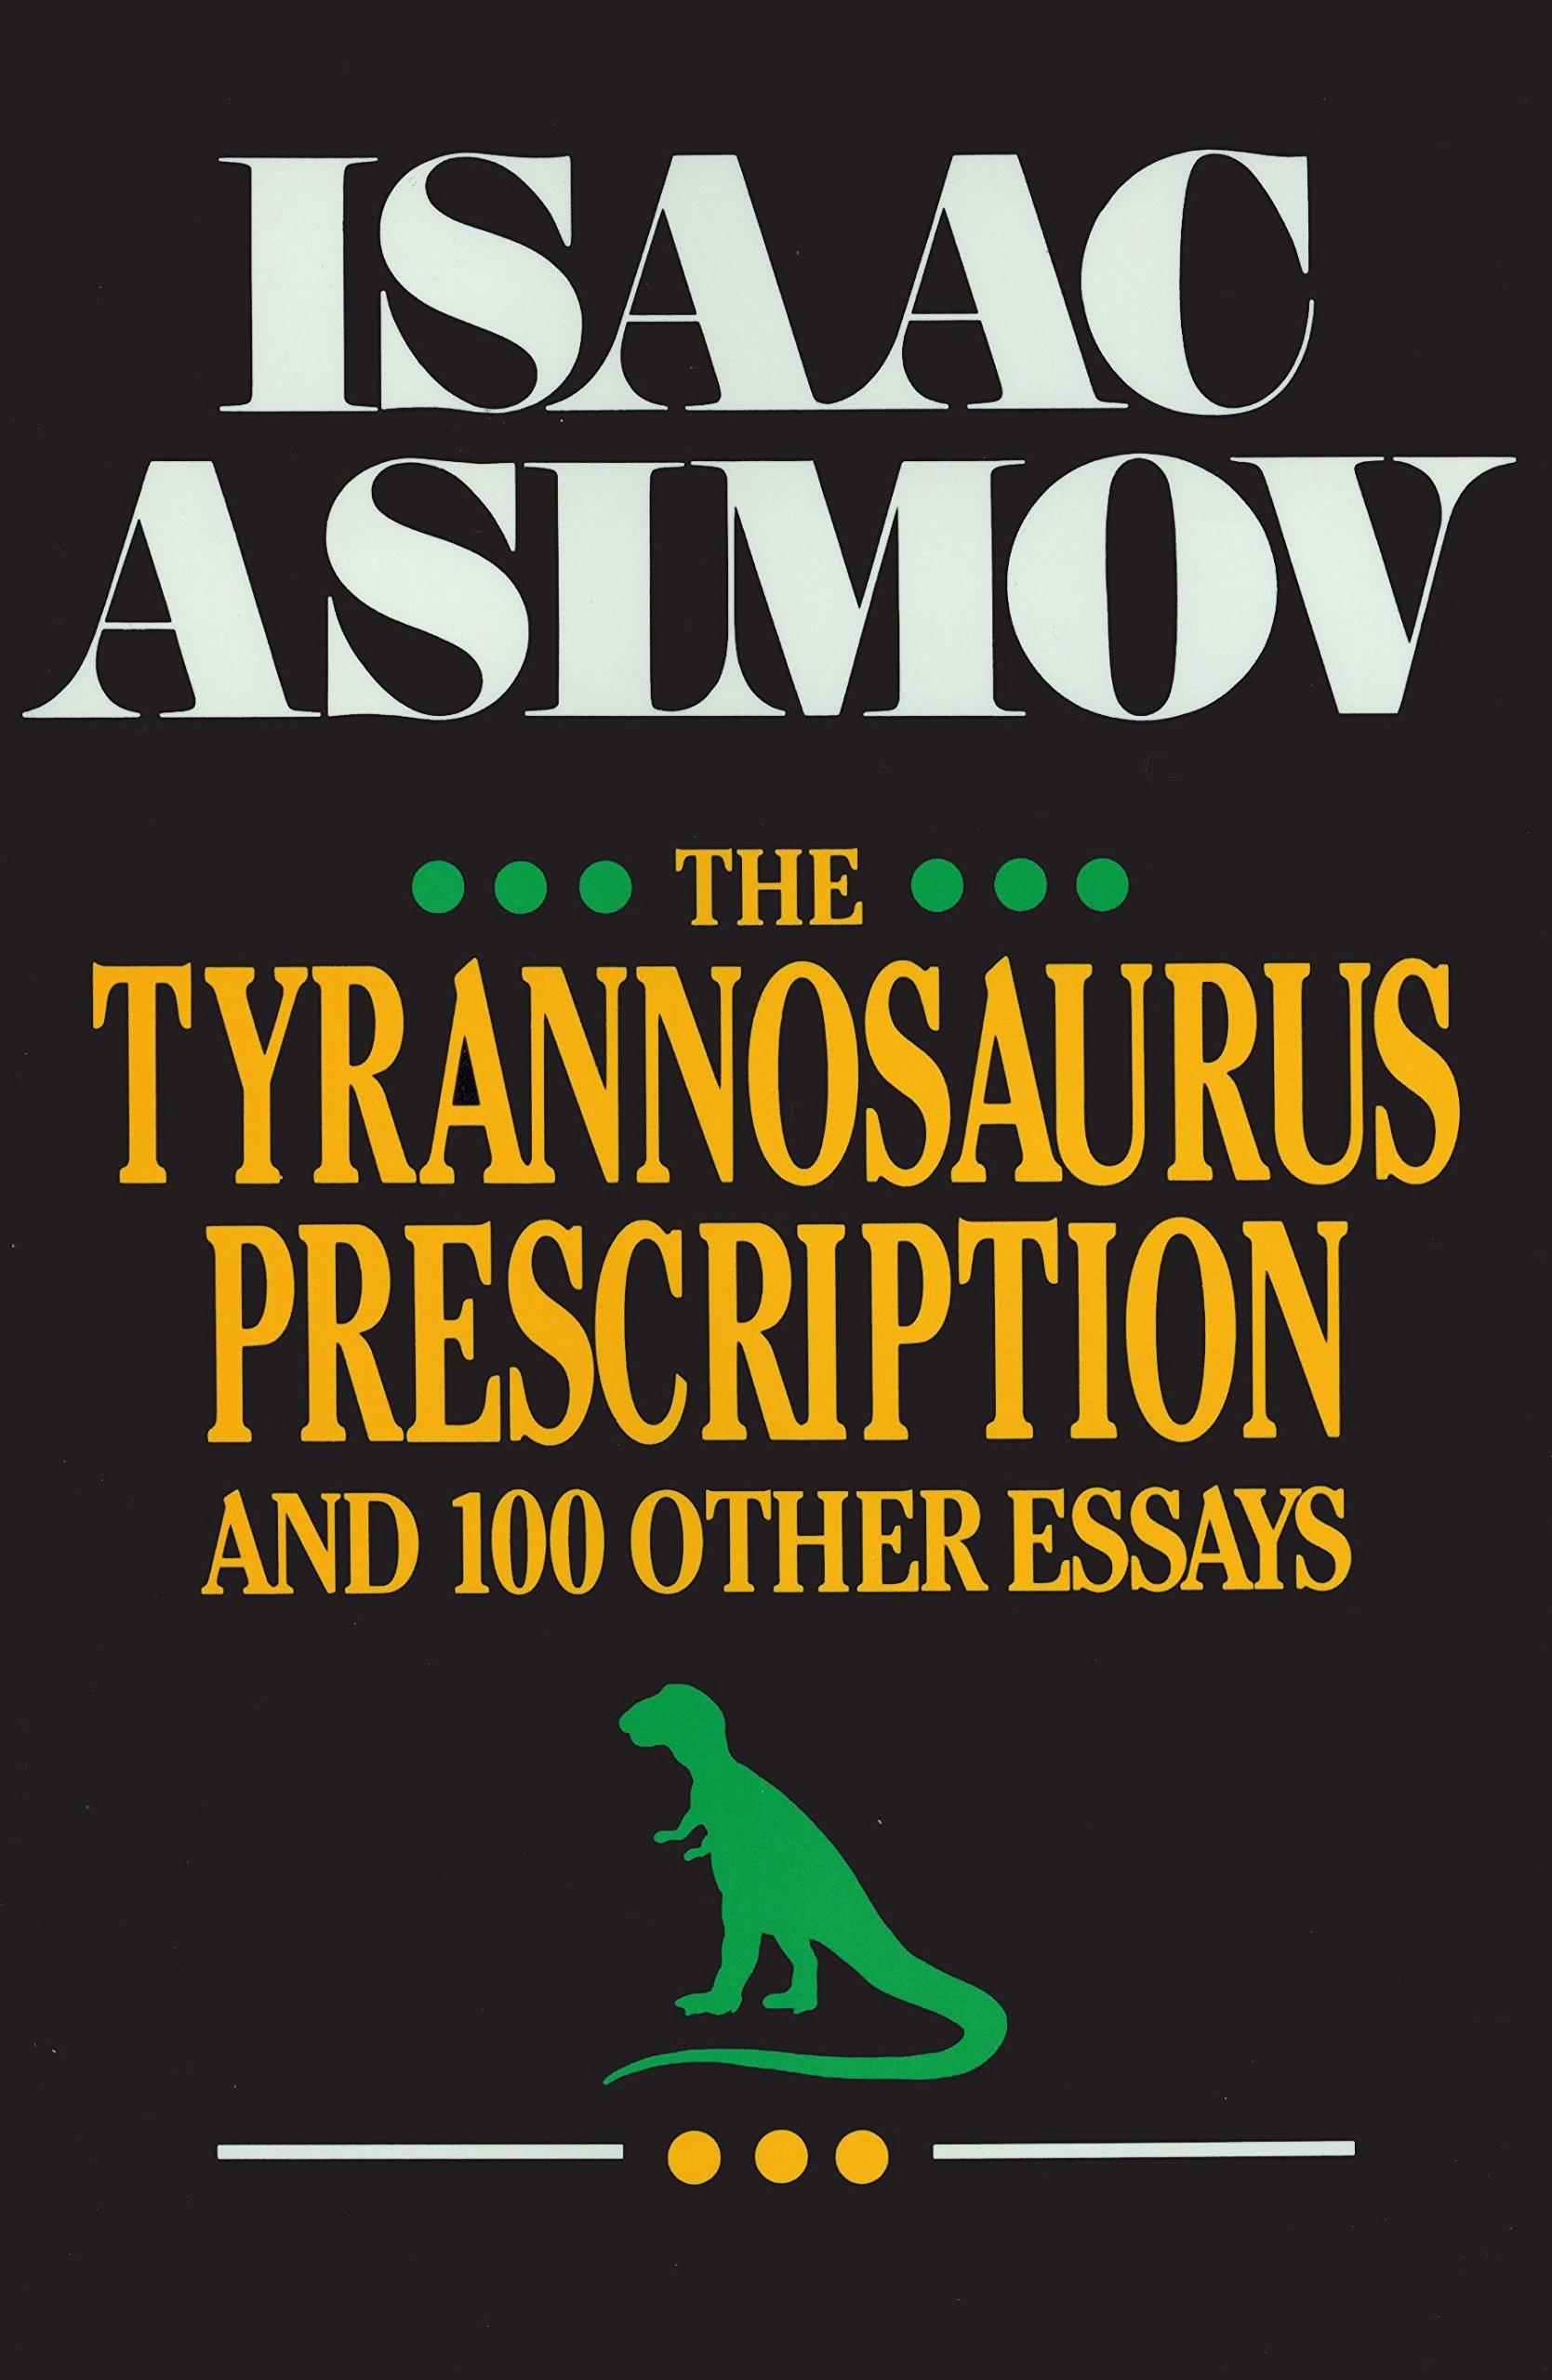 006 Essay Example Isaac Asimov Essays Awful On Creativity Intelligence Full